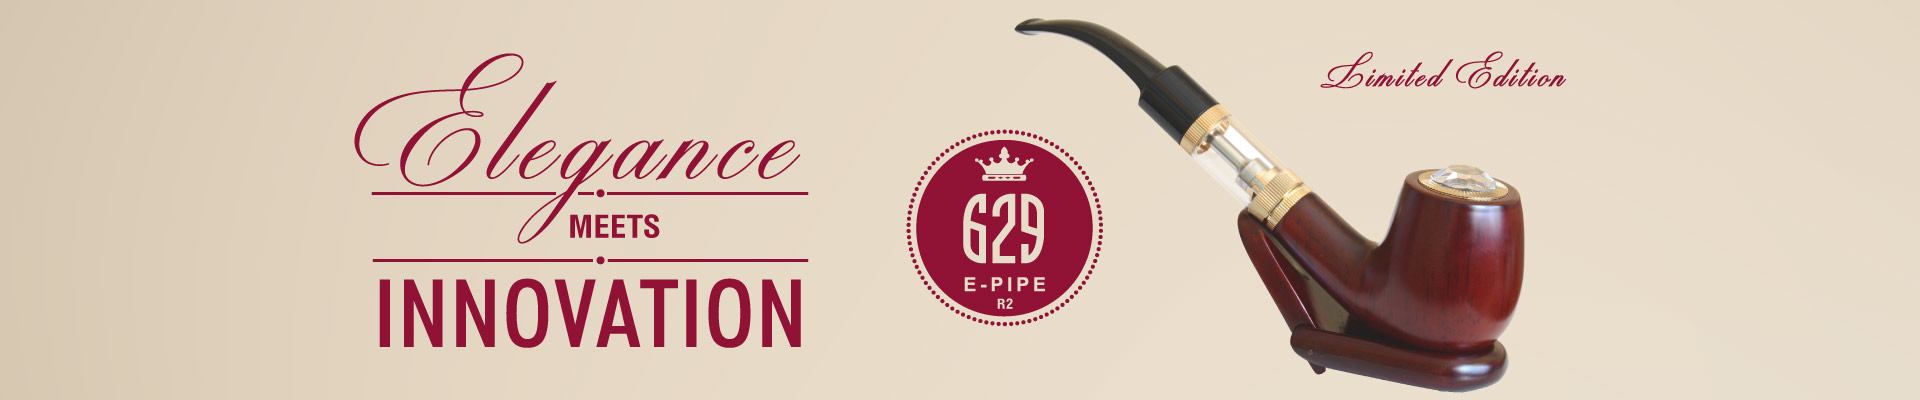 E-Pipe 629 R2 Limited Edition